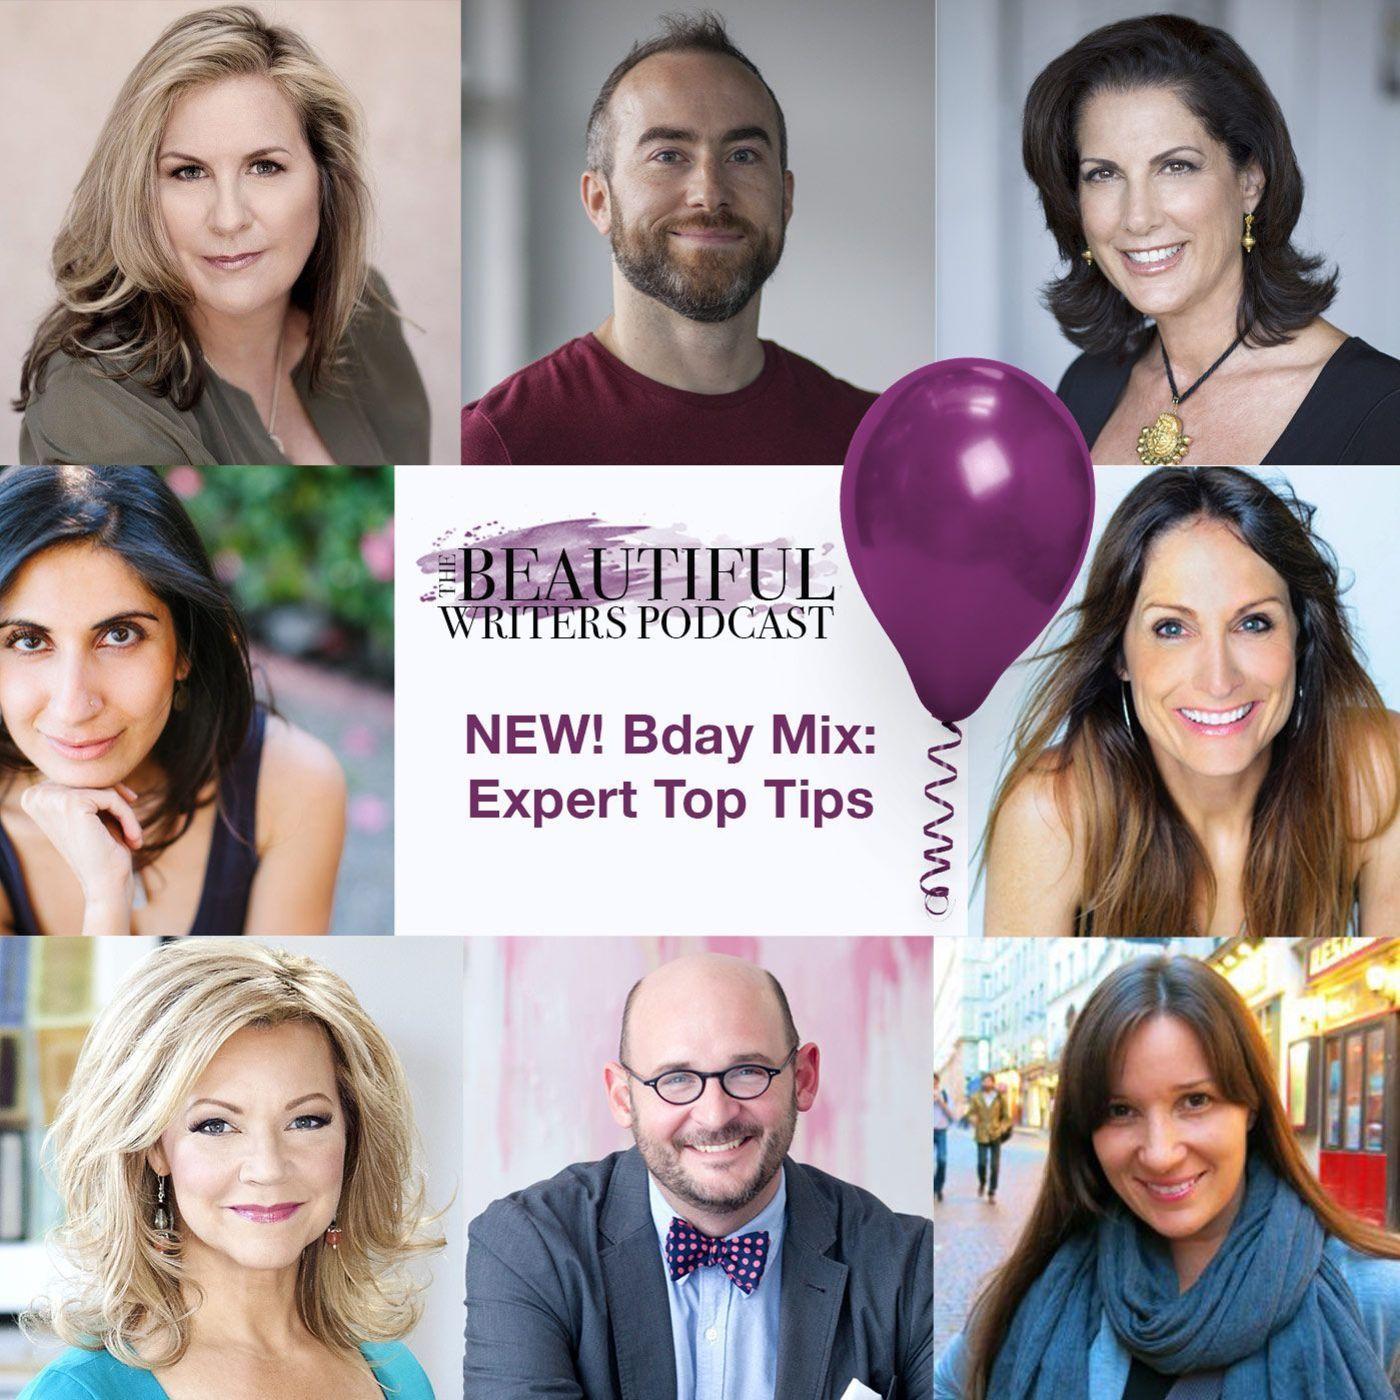 New! Bday Mix: Expert Top Tips